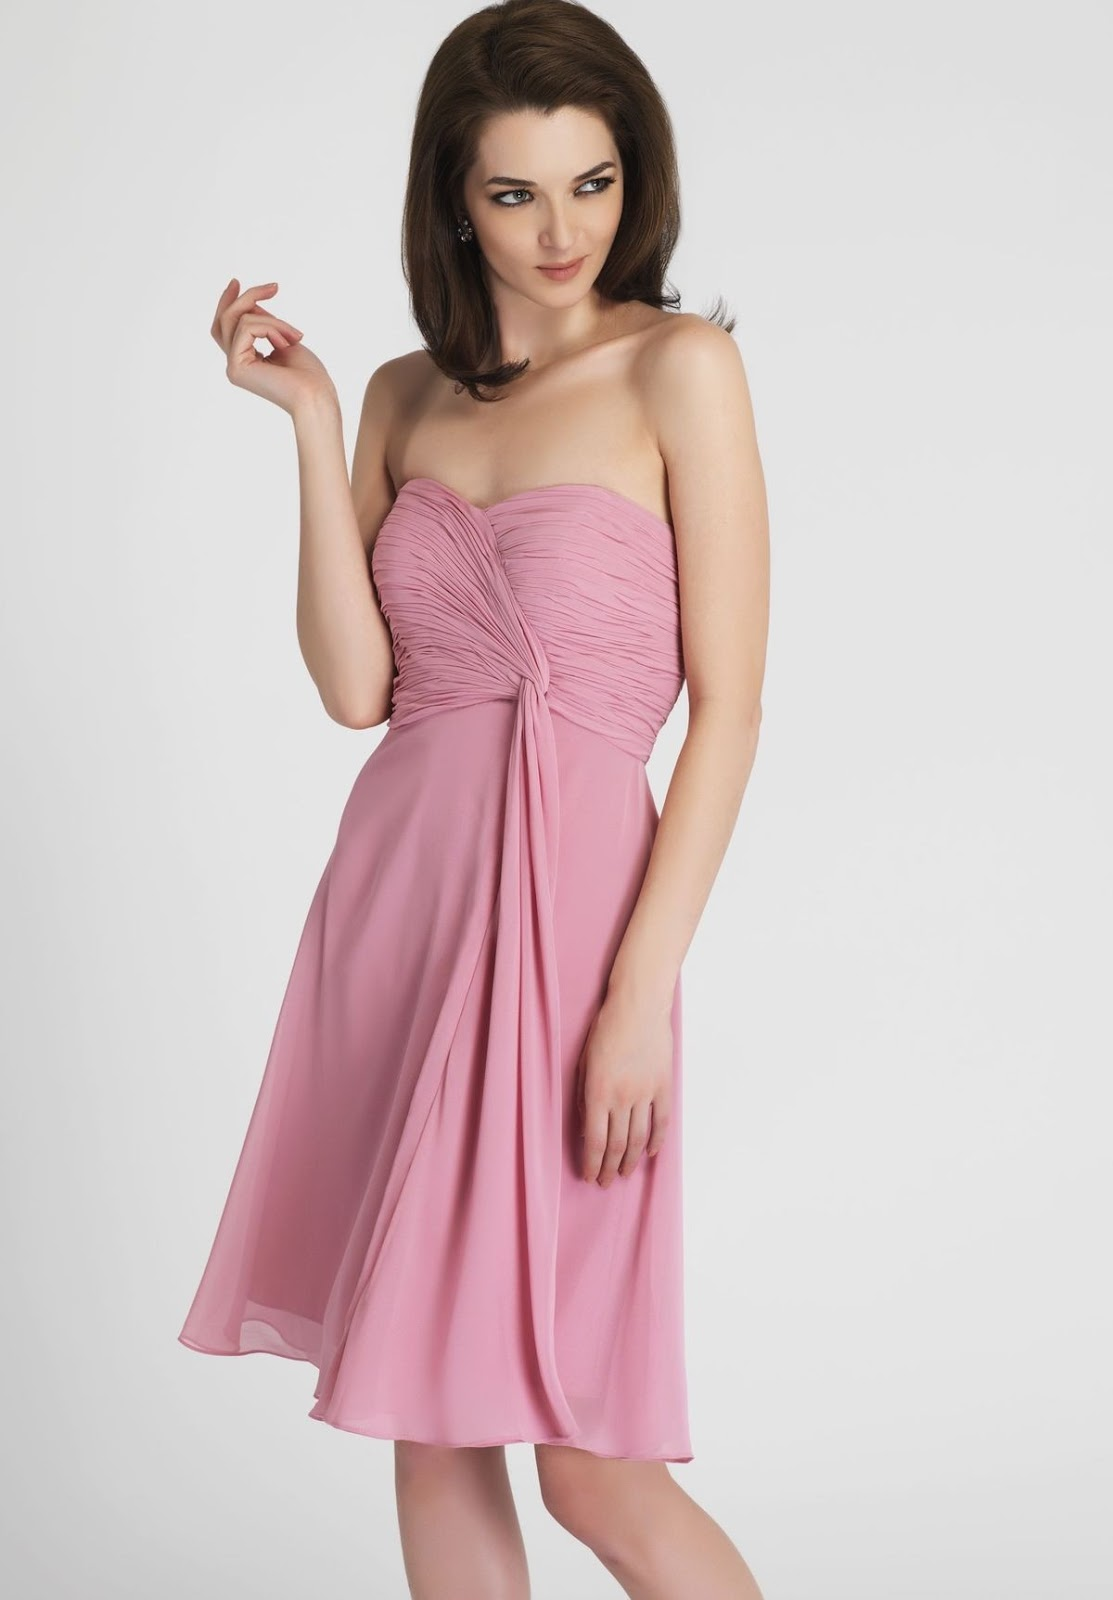 Steps for Choosing A Bridesmaid Dress